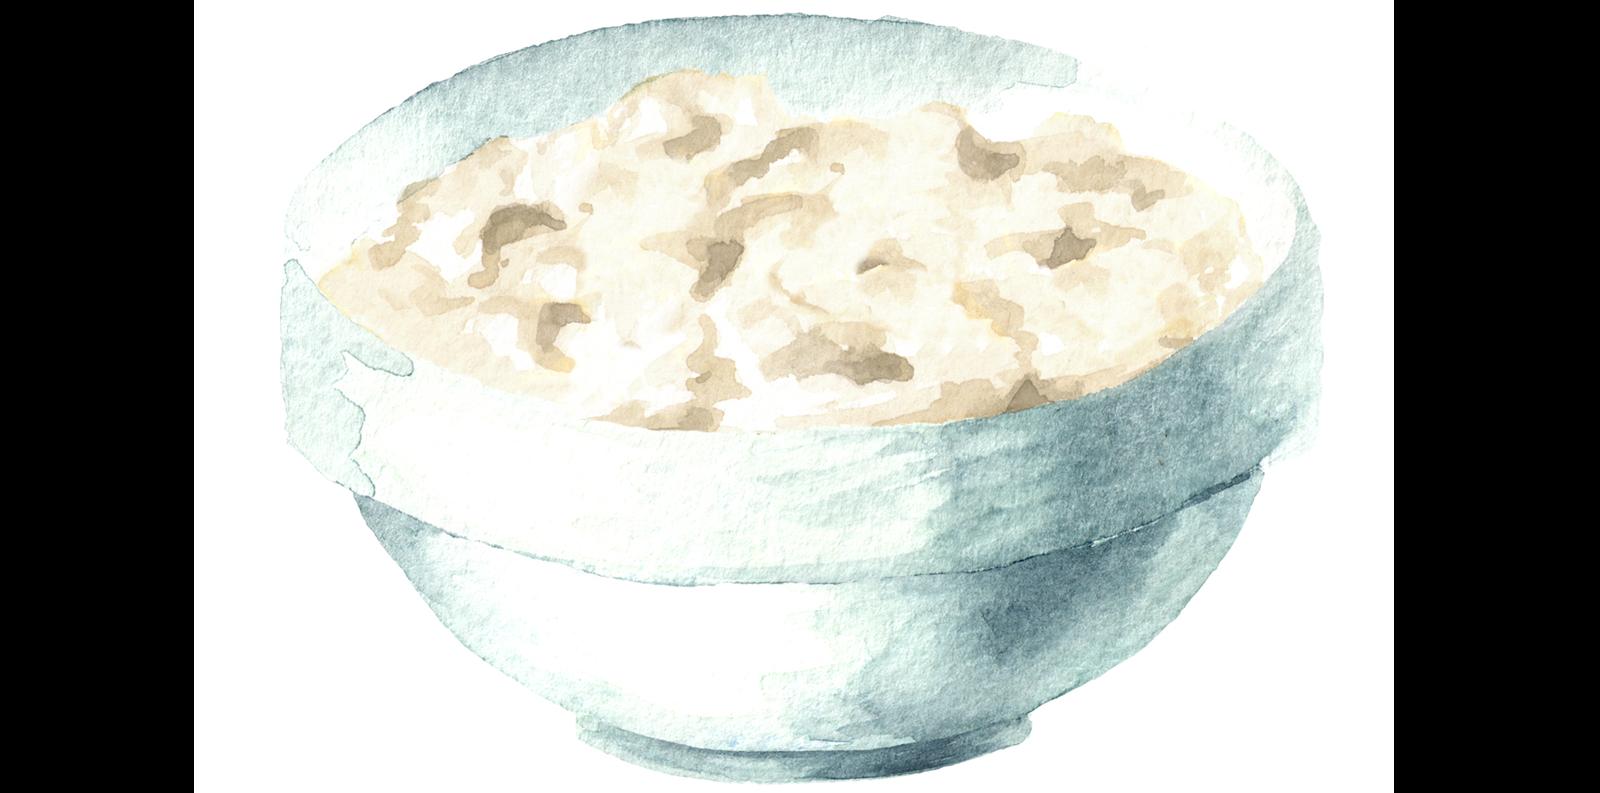 Illustration of rice pudding.